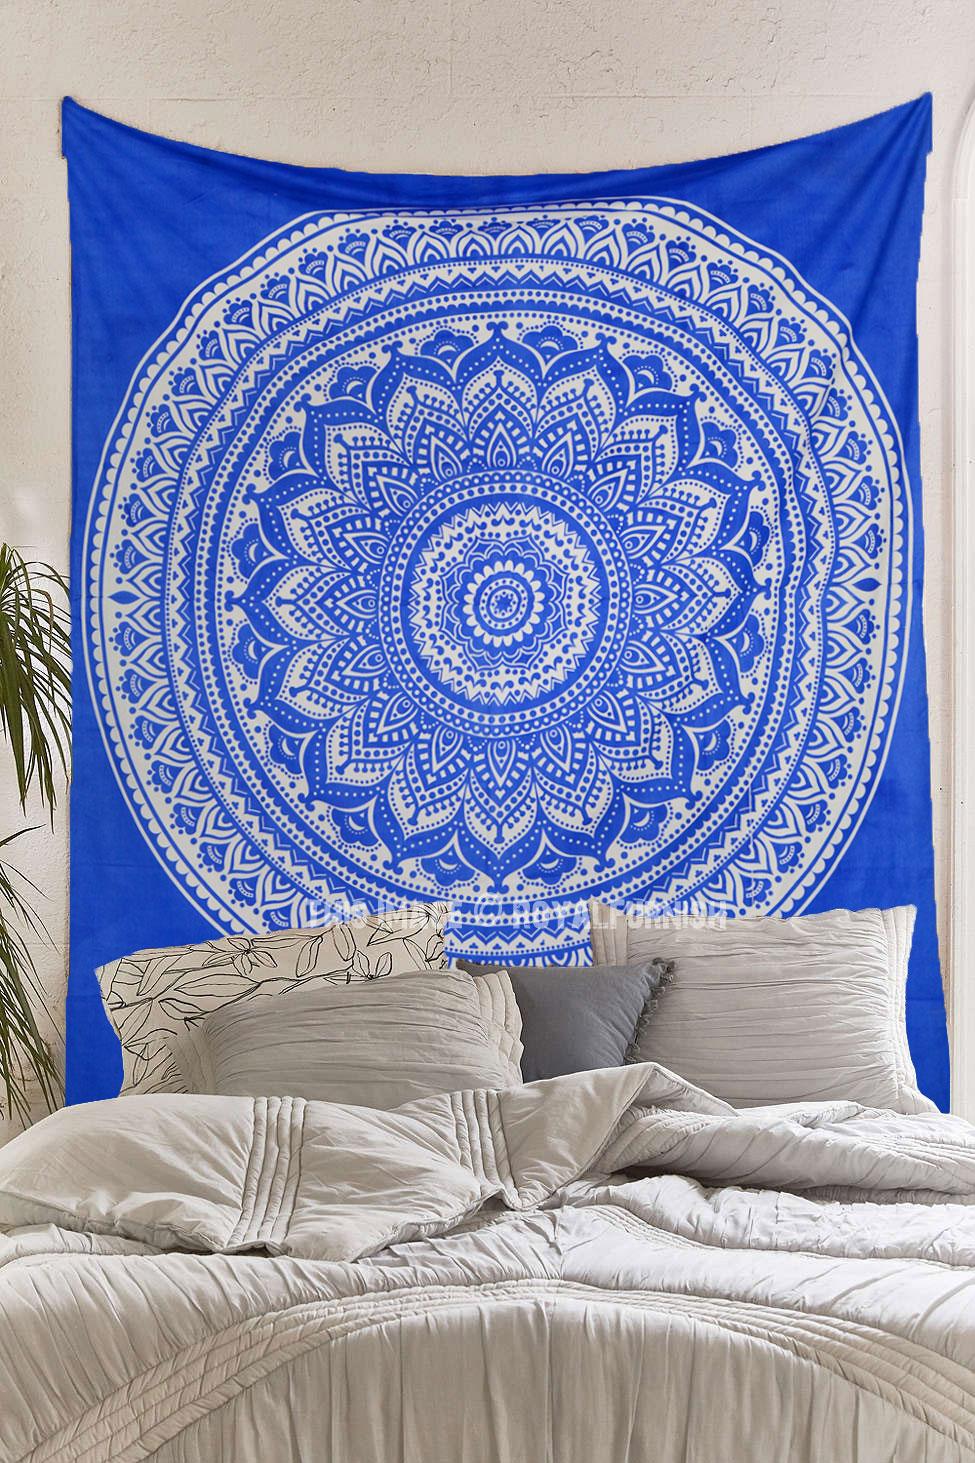 Blue multi elephants sun ombre mandala wall tapestry royalfurnish - Royal Blue Bohemian Dreams Mandala Throw Bedspread Wall Tapestry